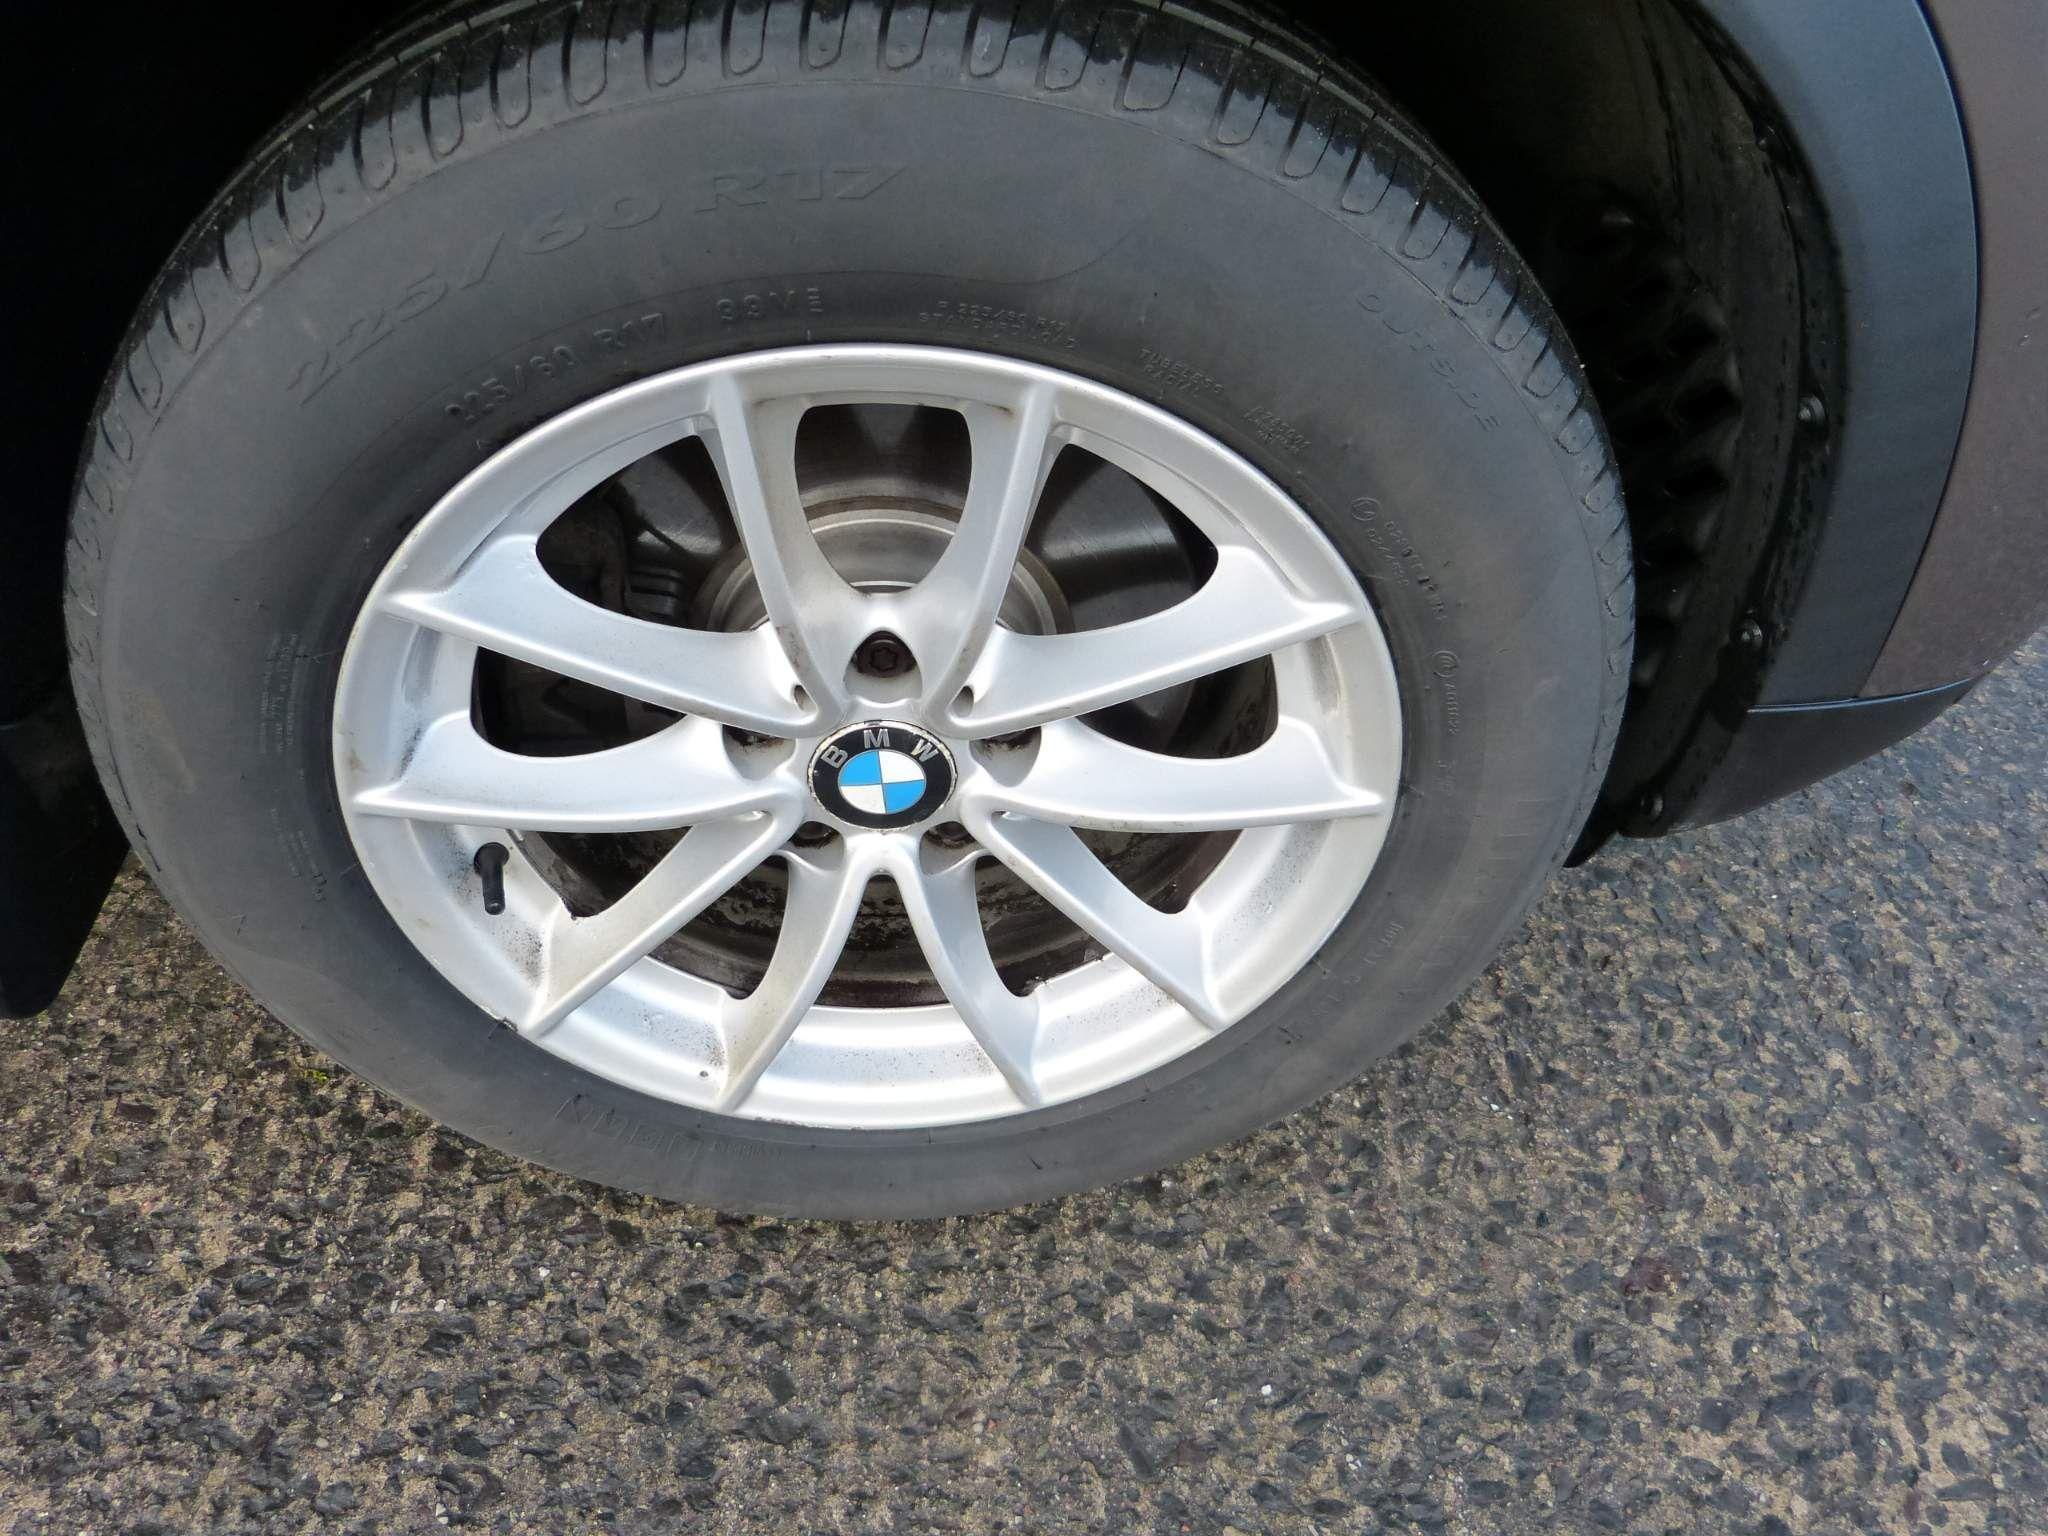 2013 BMW X3 2.0 20d SE Auto xDrive Diesel Automatic  – Beechlawn Motors Belfast full